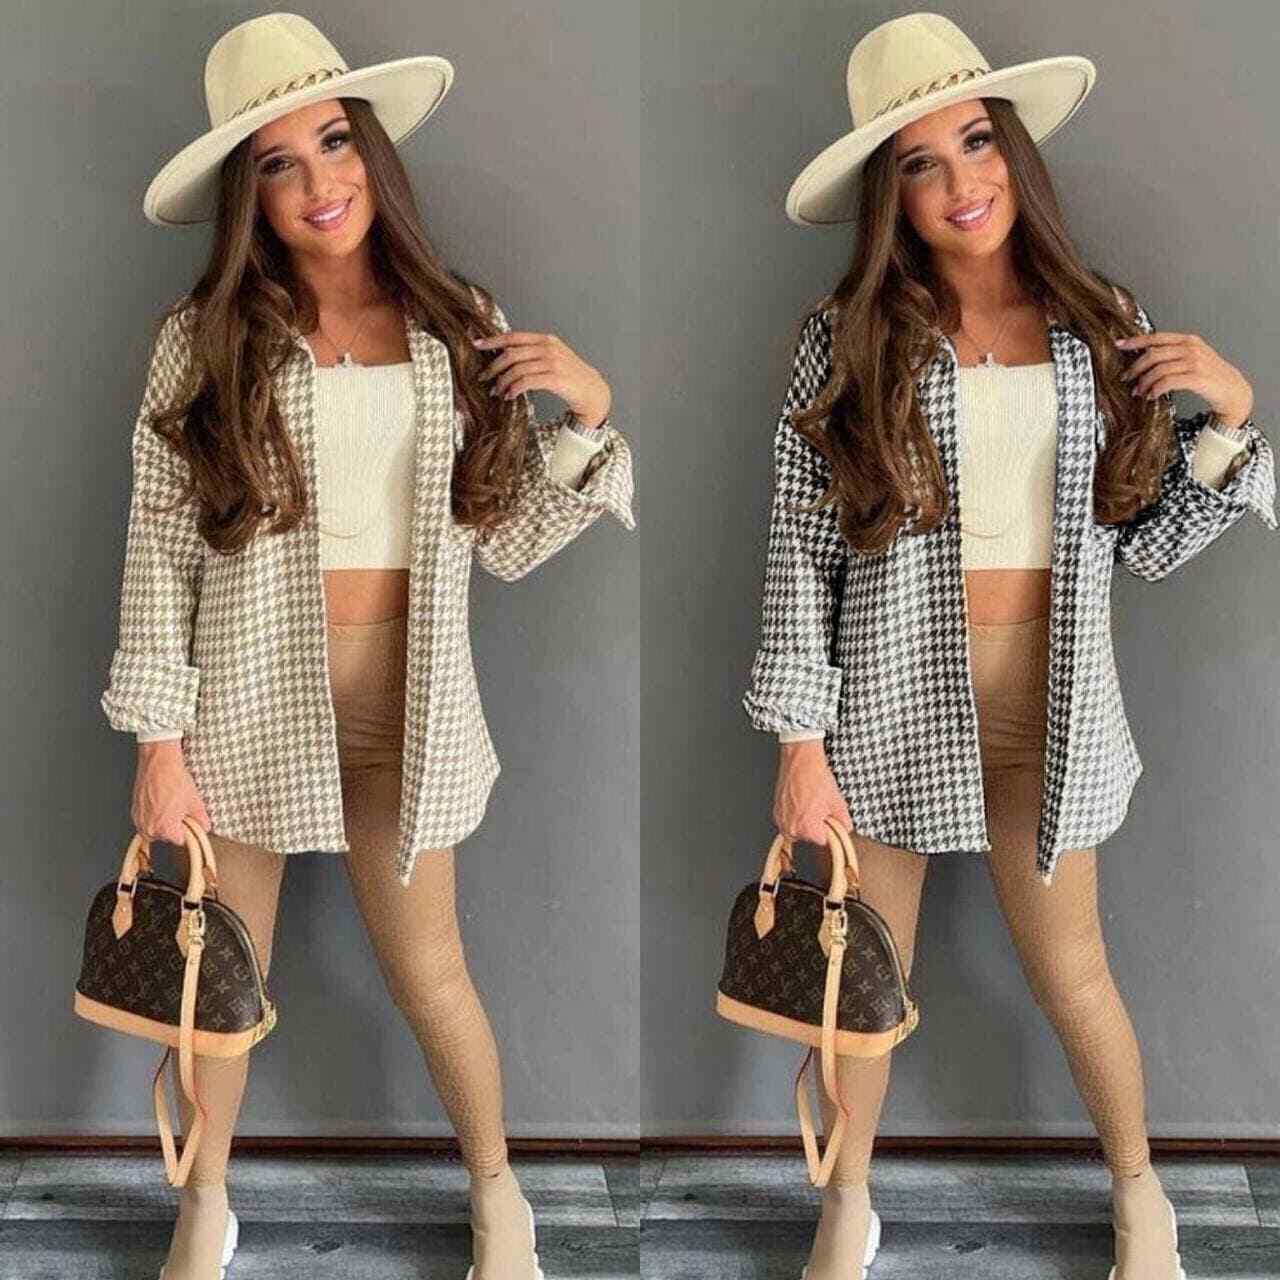 Women's Italian Dogtooth Shacket Ladies Oversized Button Shirt Jacket Top